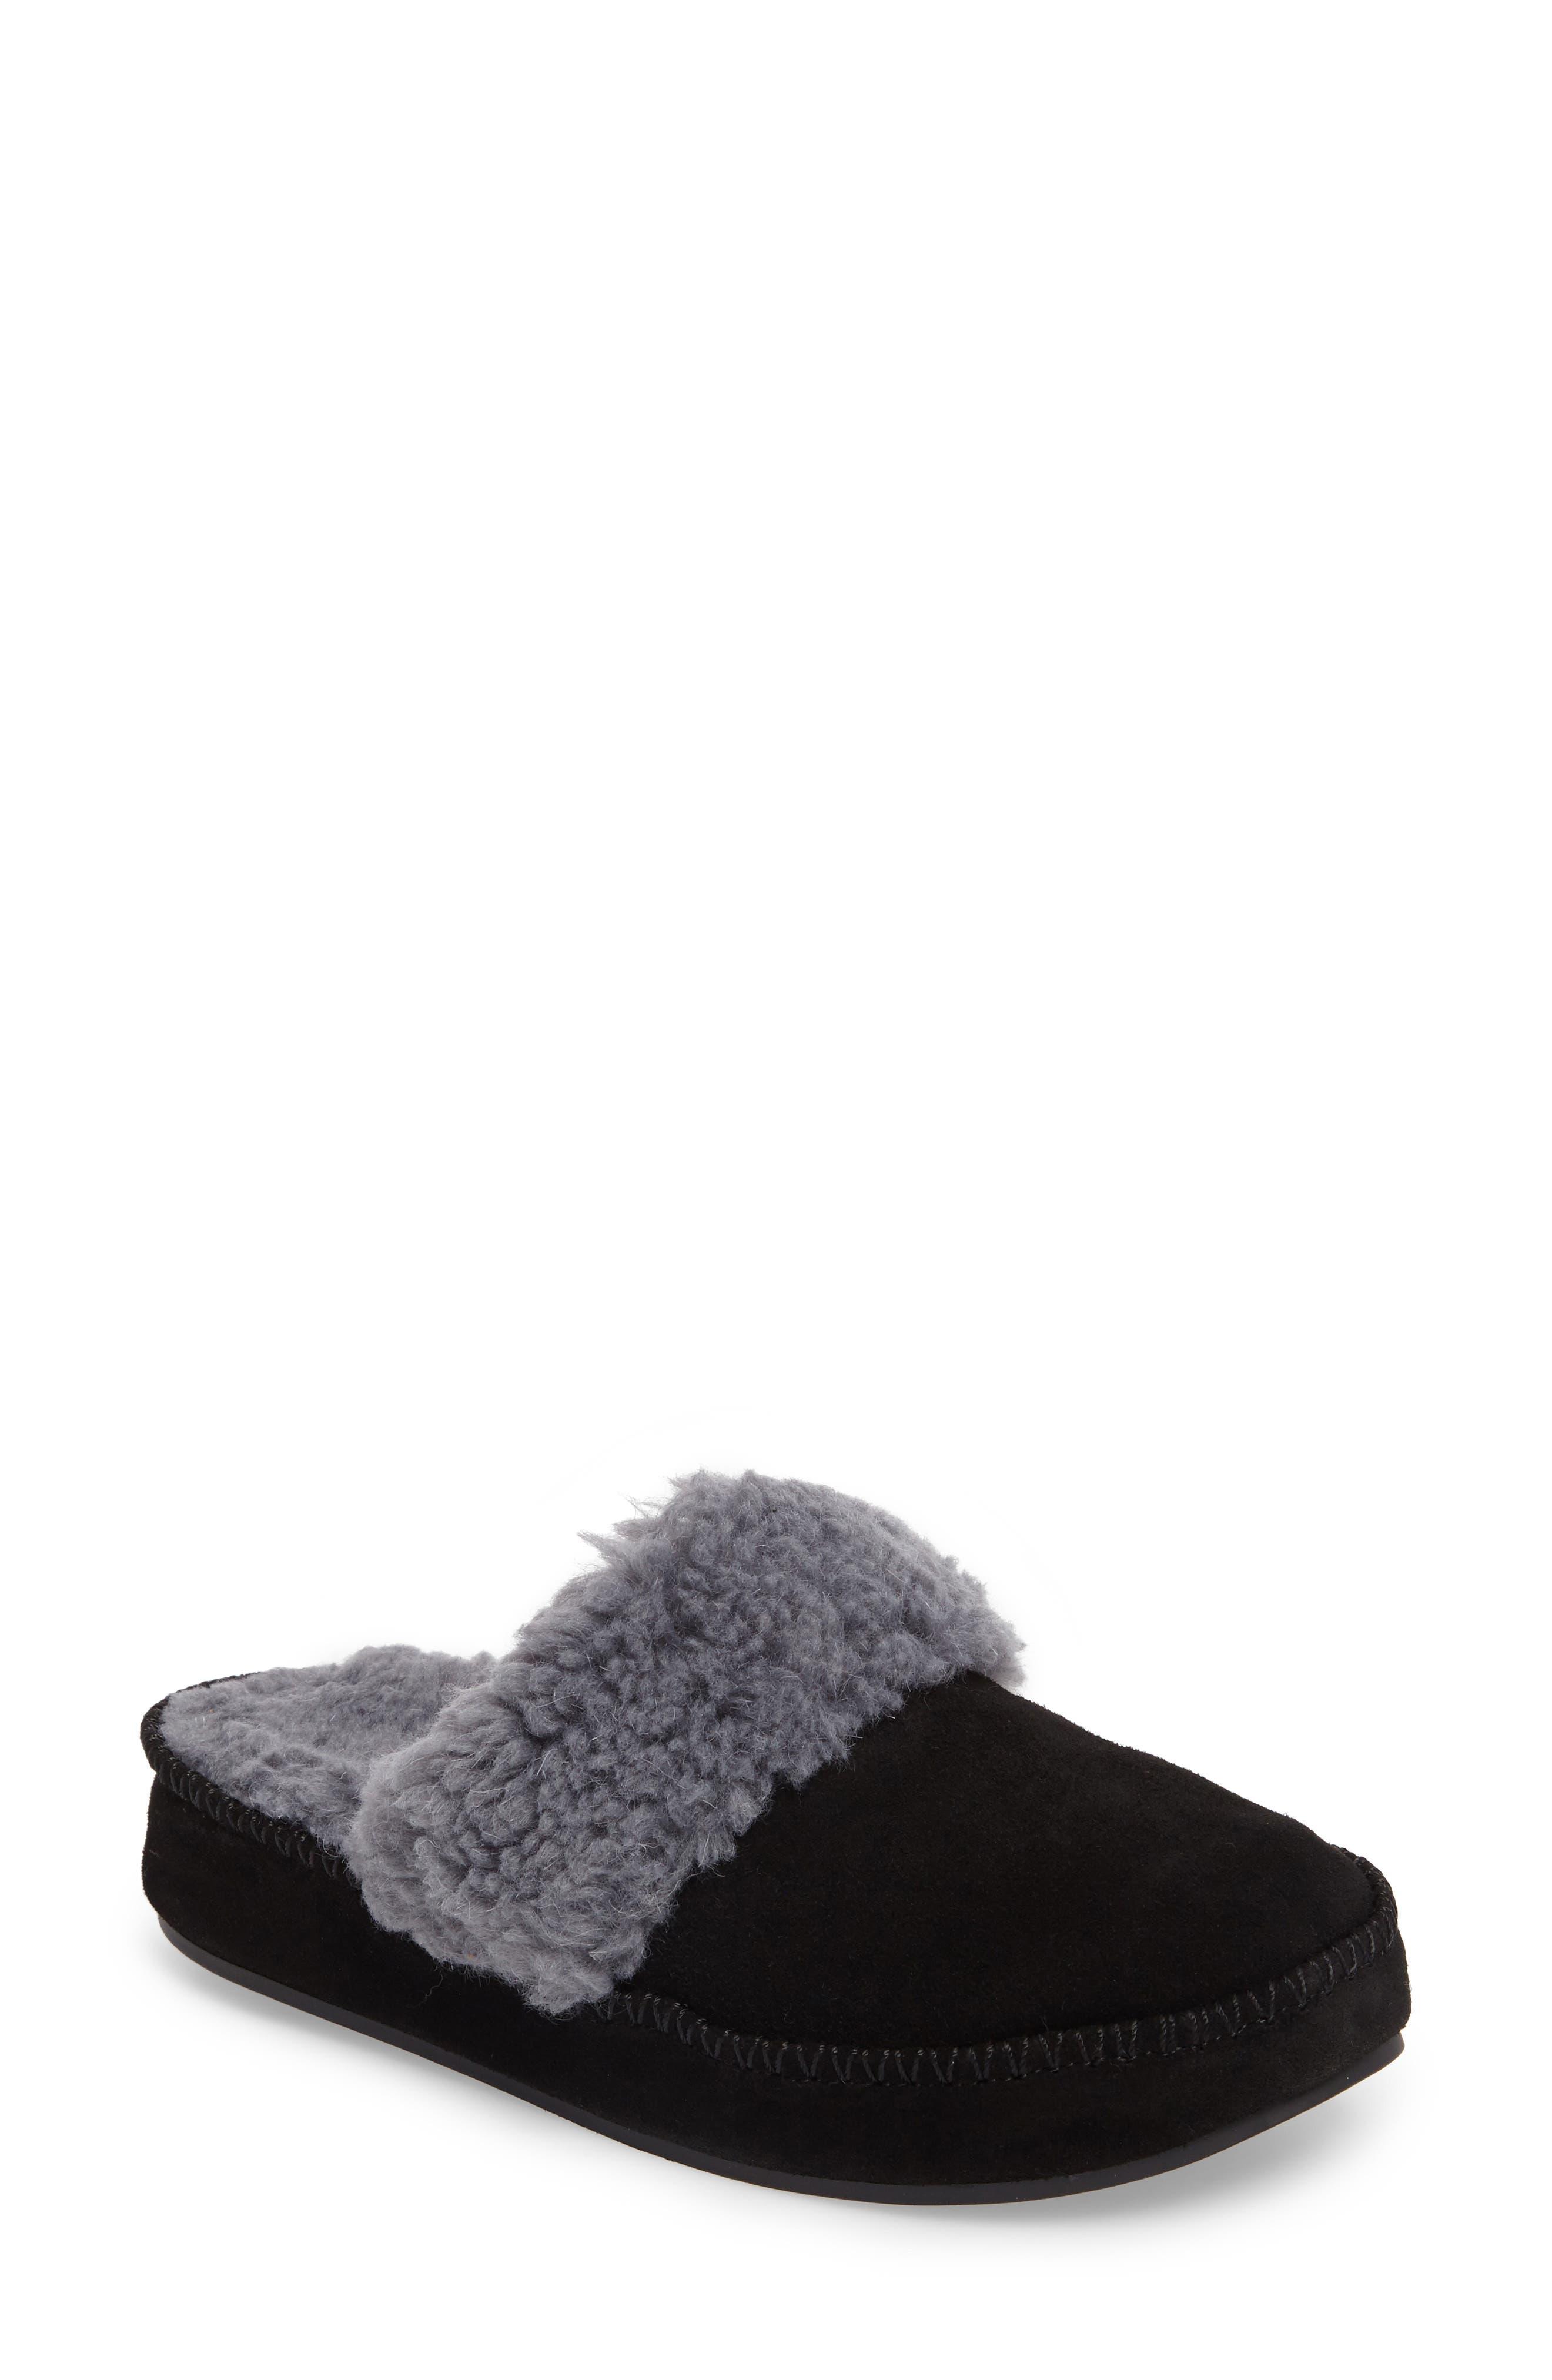 VIONIC Marley Faux Fur Slipper, Main, color, BLACK SUEDE